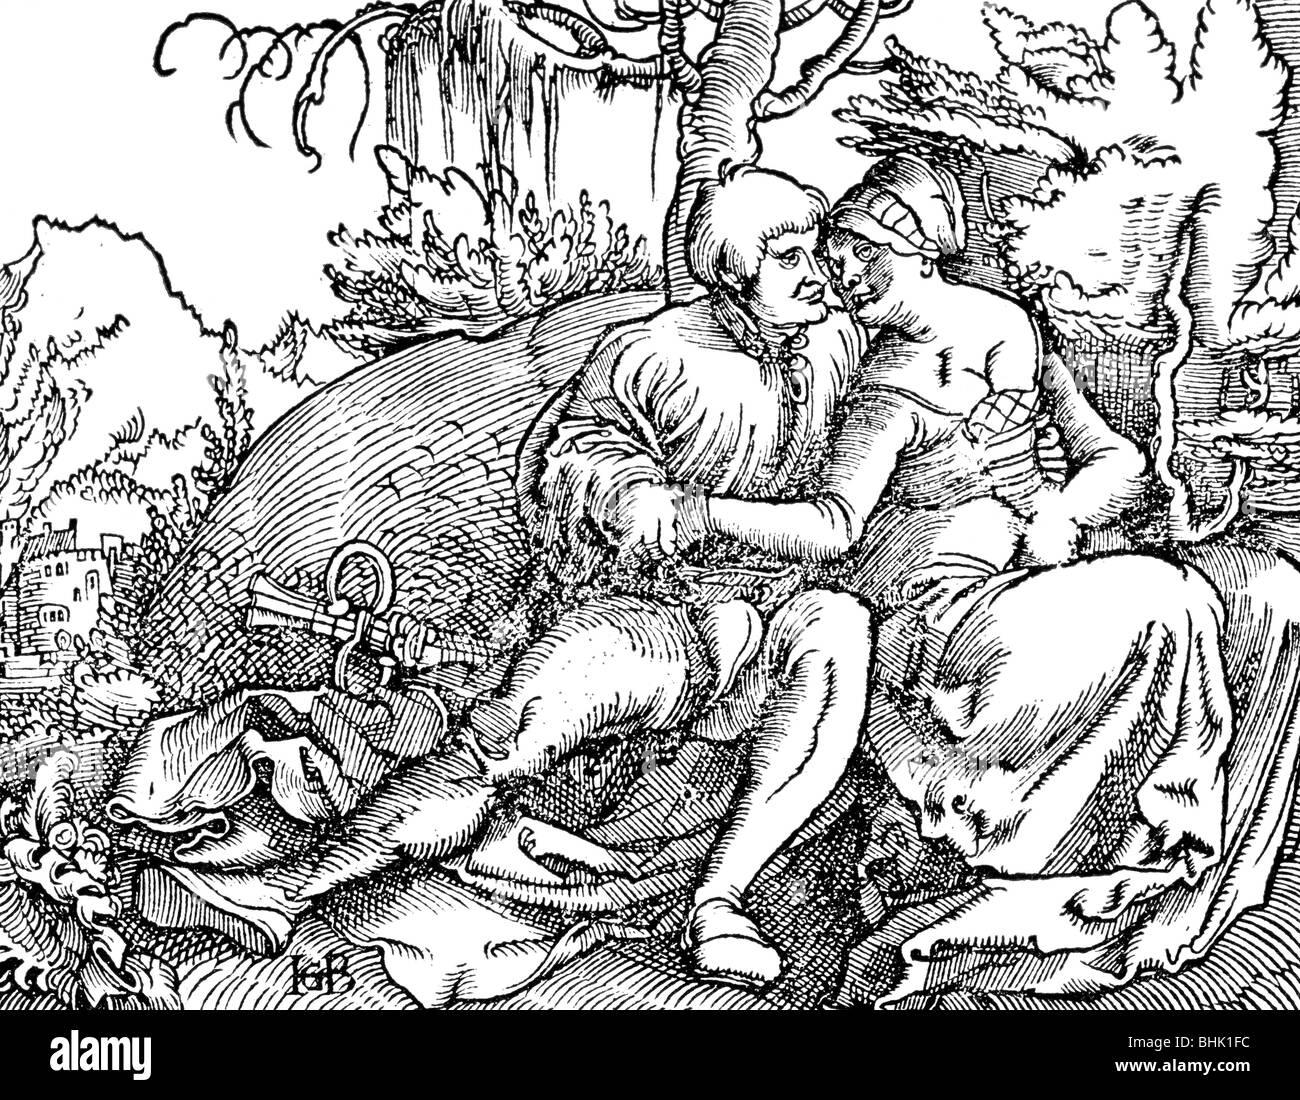 Geiler von Kaisersberg, Johann, 16.3.1445 - 10.3.1510, German clergyman, works, 'Fragmenta passionis', woodcut, - Stock Image